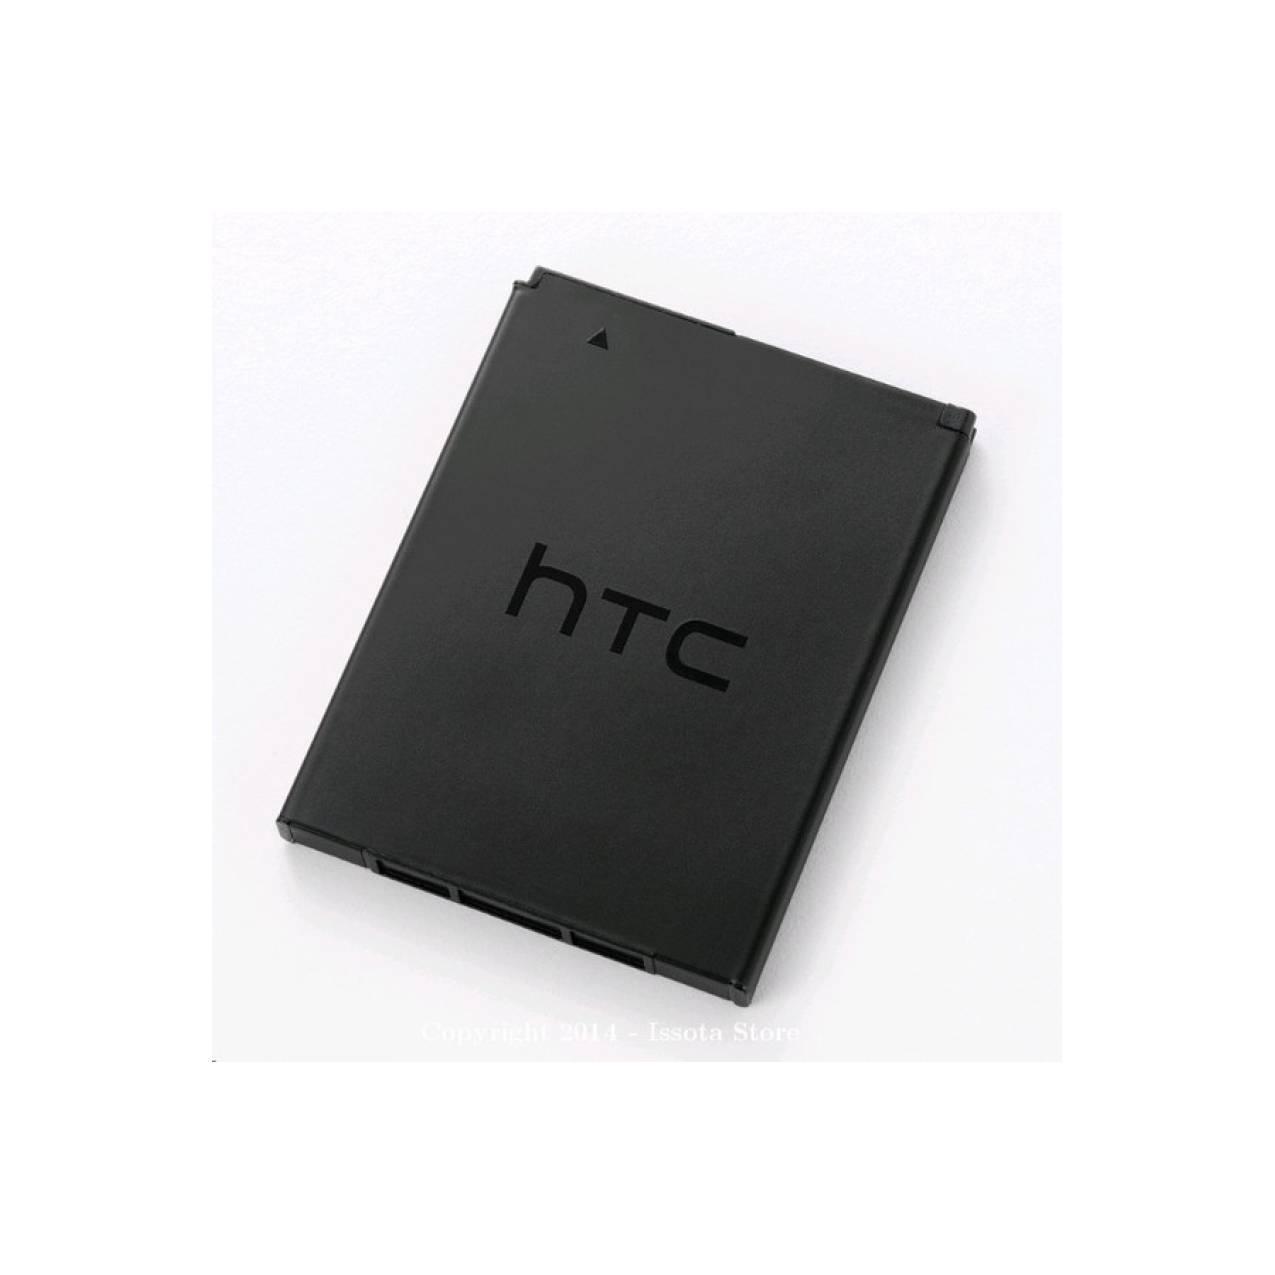 Battery HTC T528 / One SV / SU / SC / ONE ST Seri BM60100 Original 100